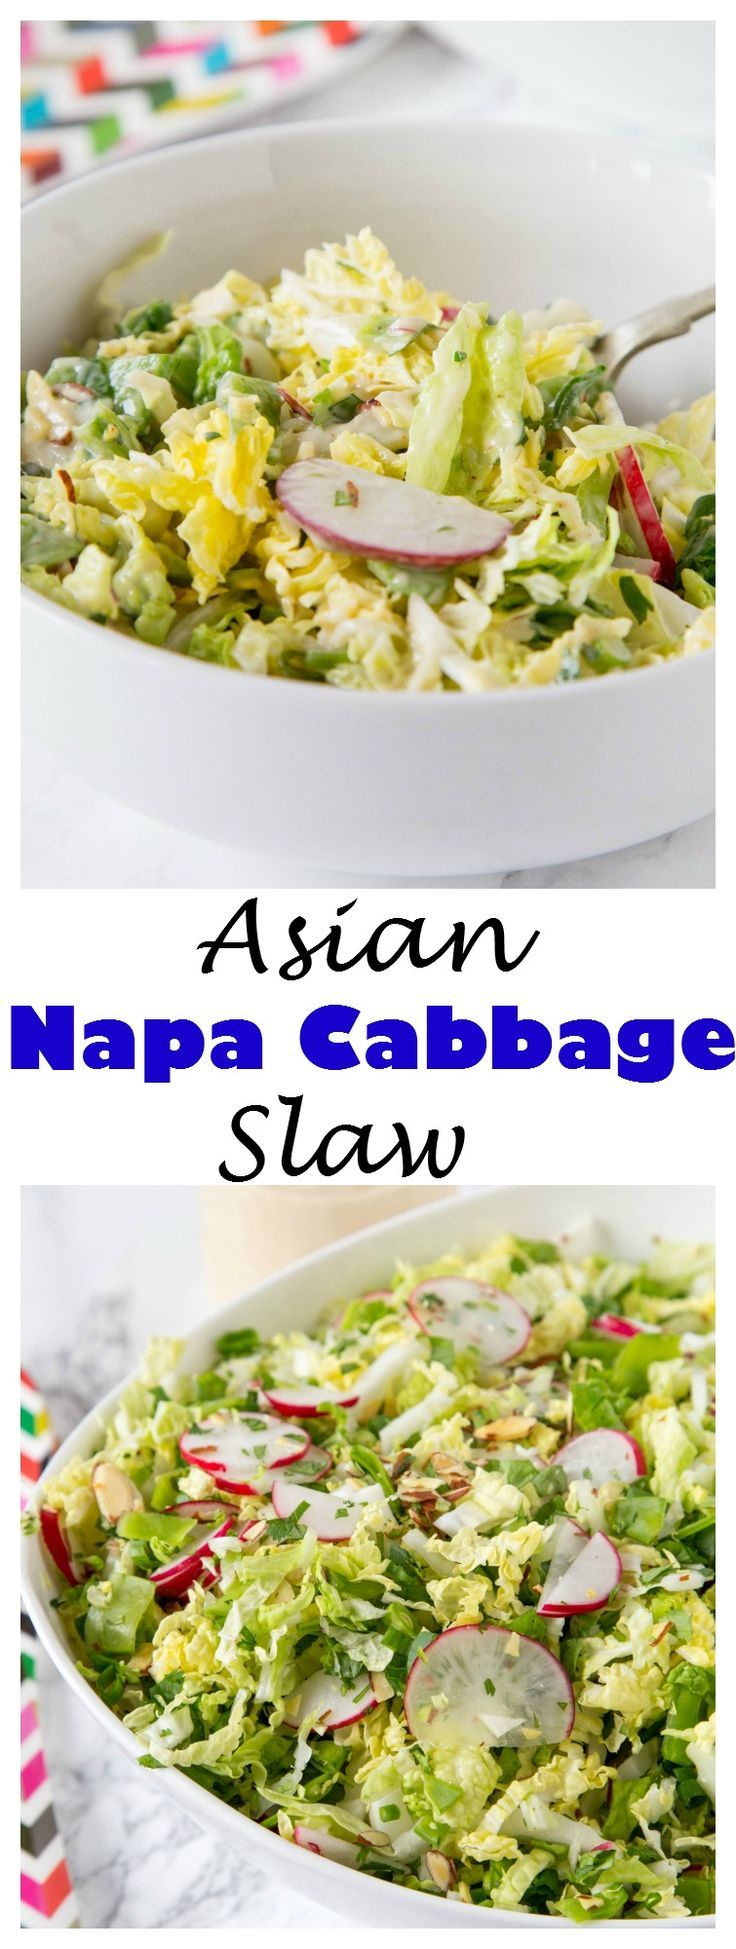 17+ best ideas about Napa Cabbage Salad on Pinterest ...